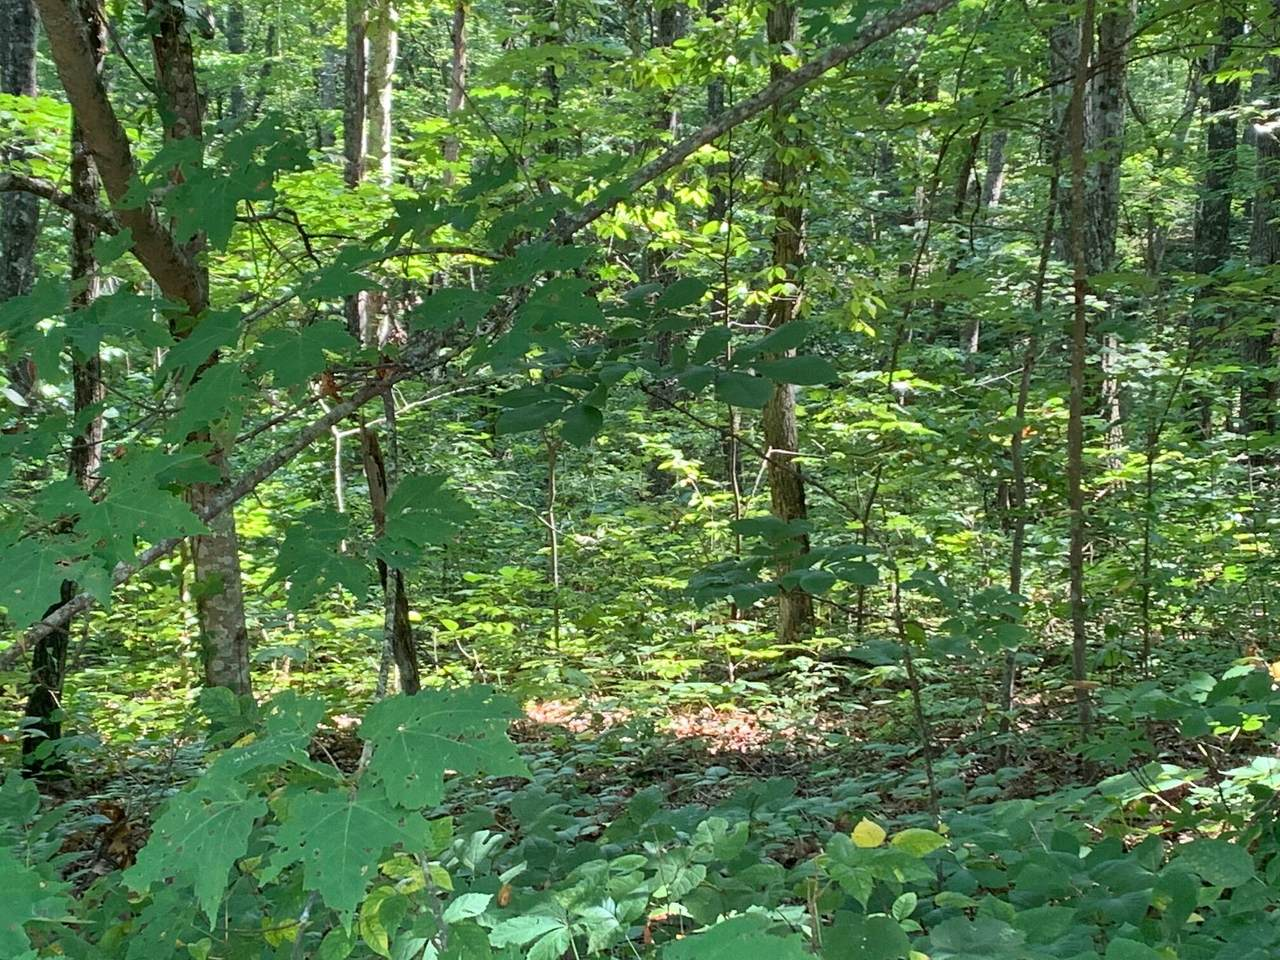 Running Deer - Photo 1